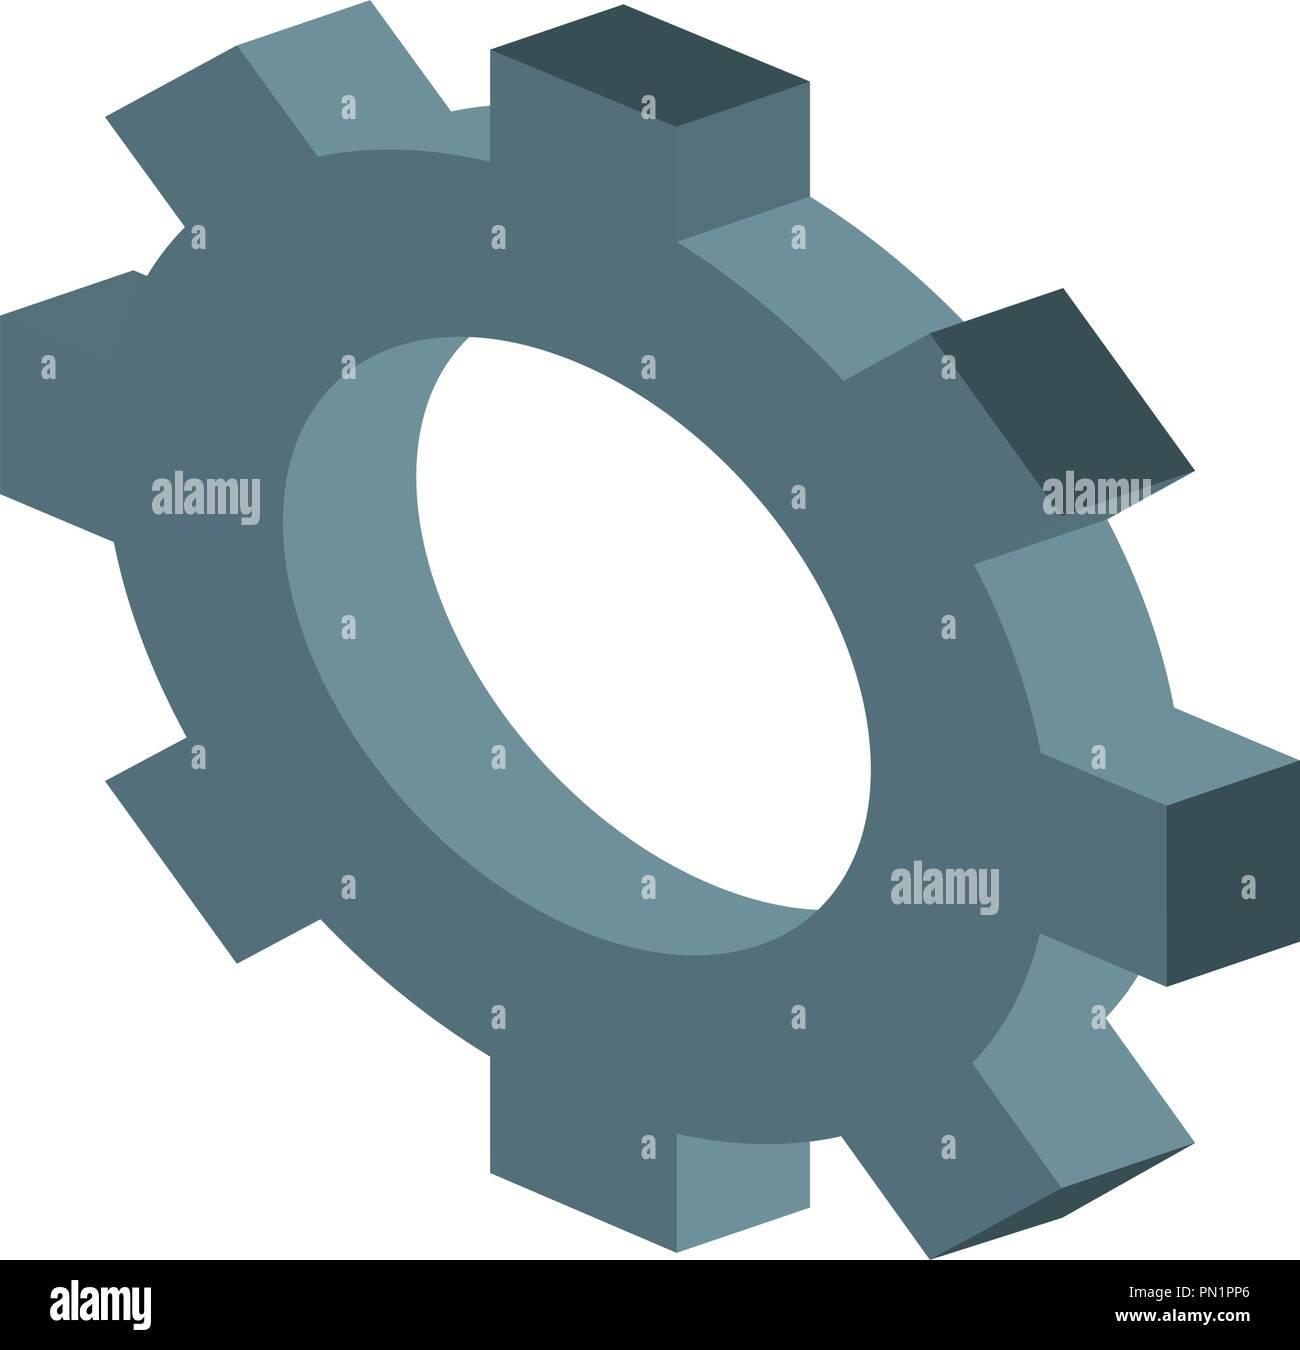 Gears isometric symbol - Stock Image